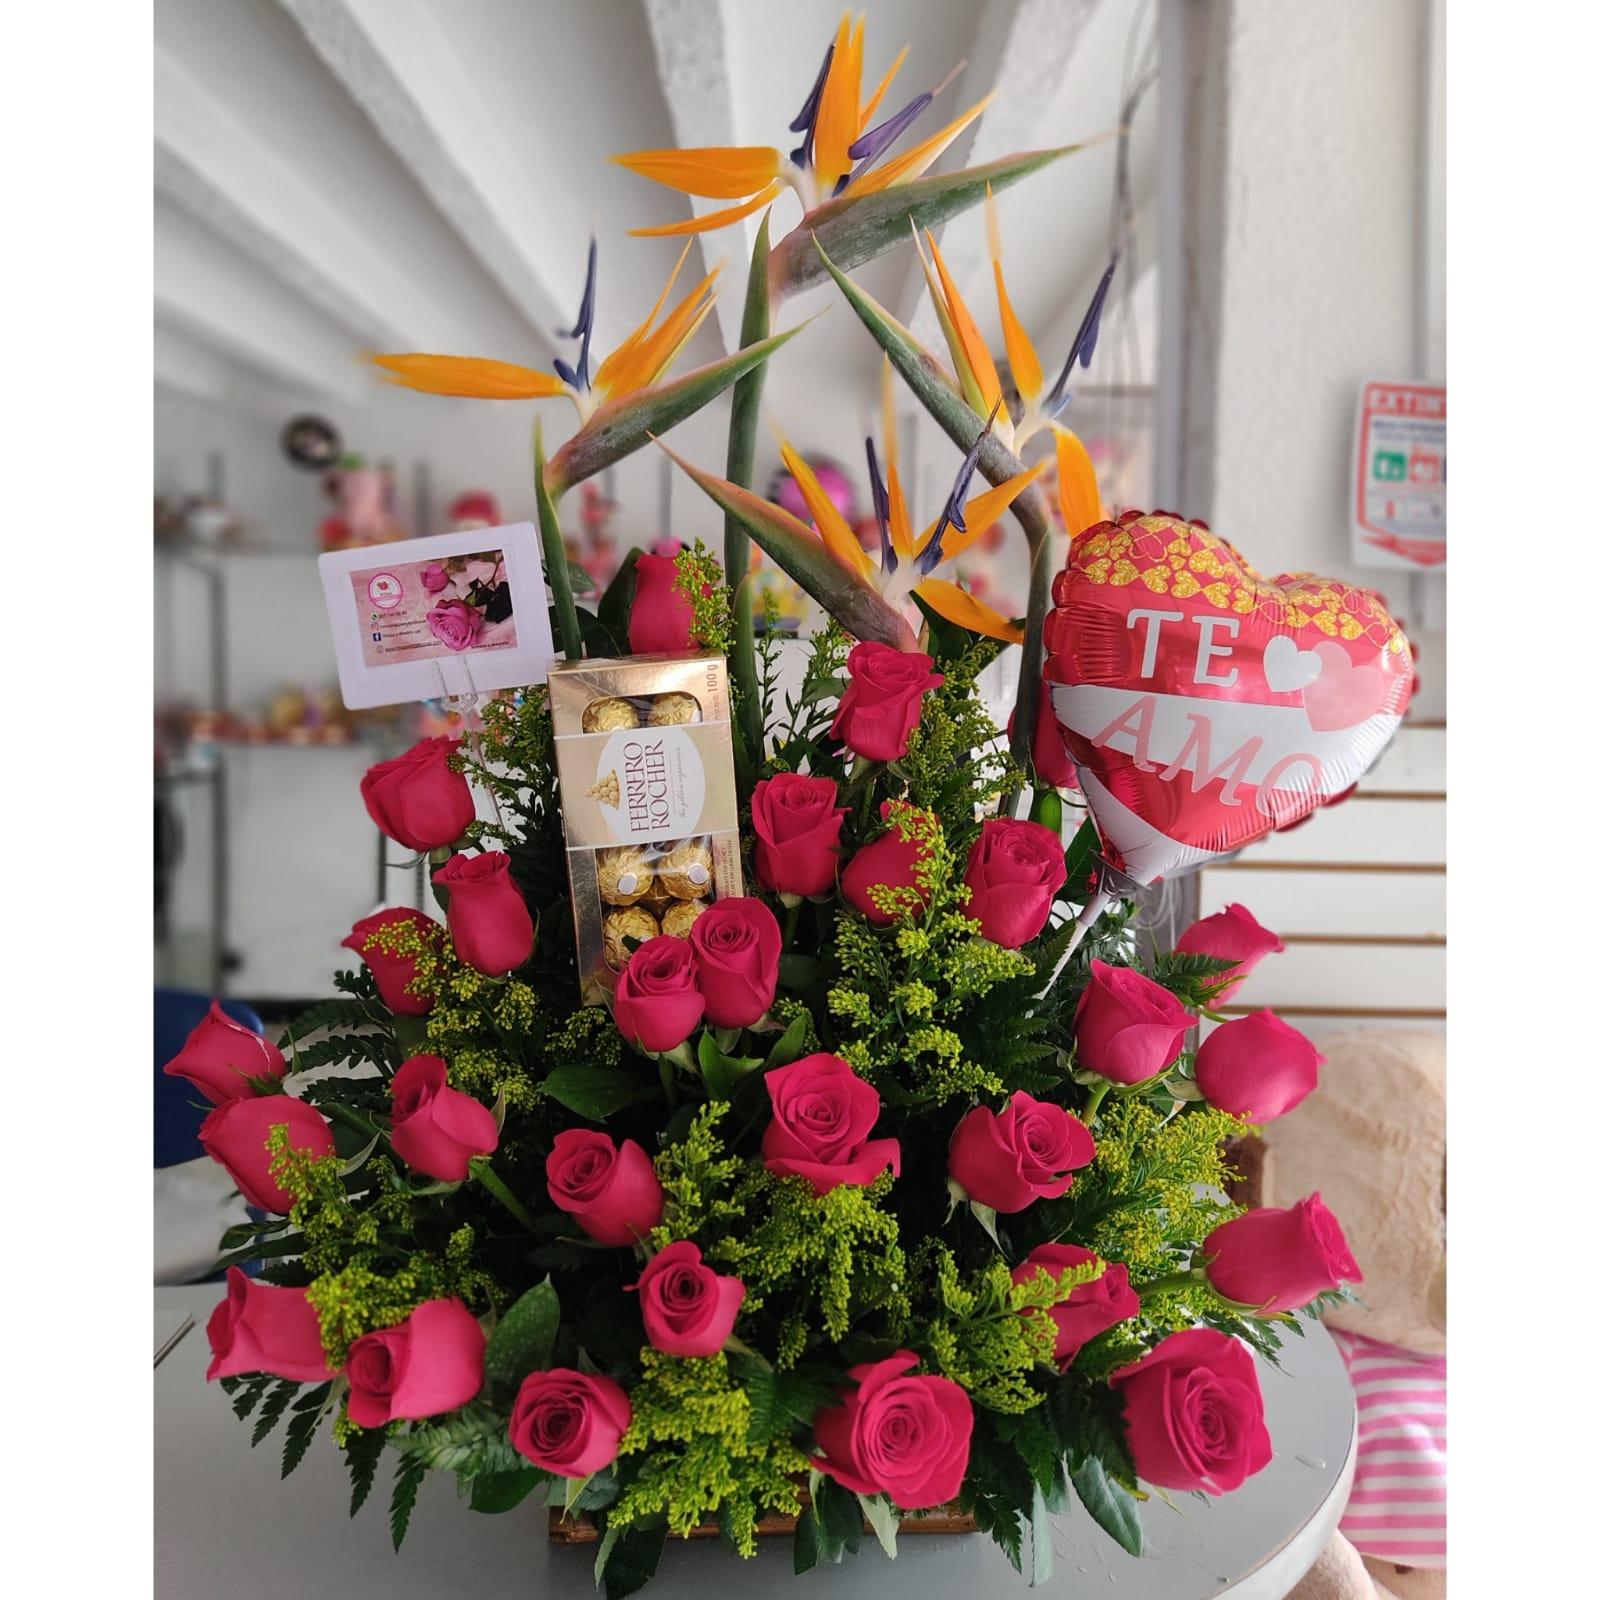 Rosas, Ferreros, Globo y tarjetas